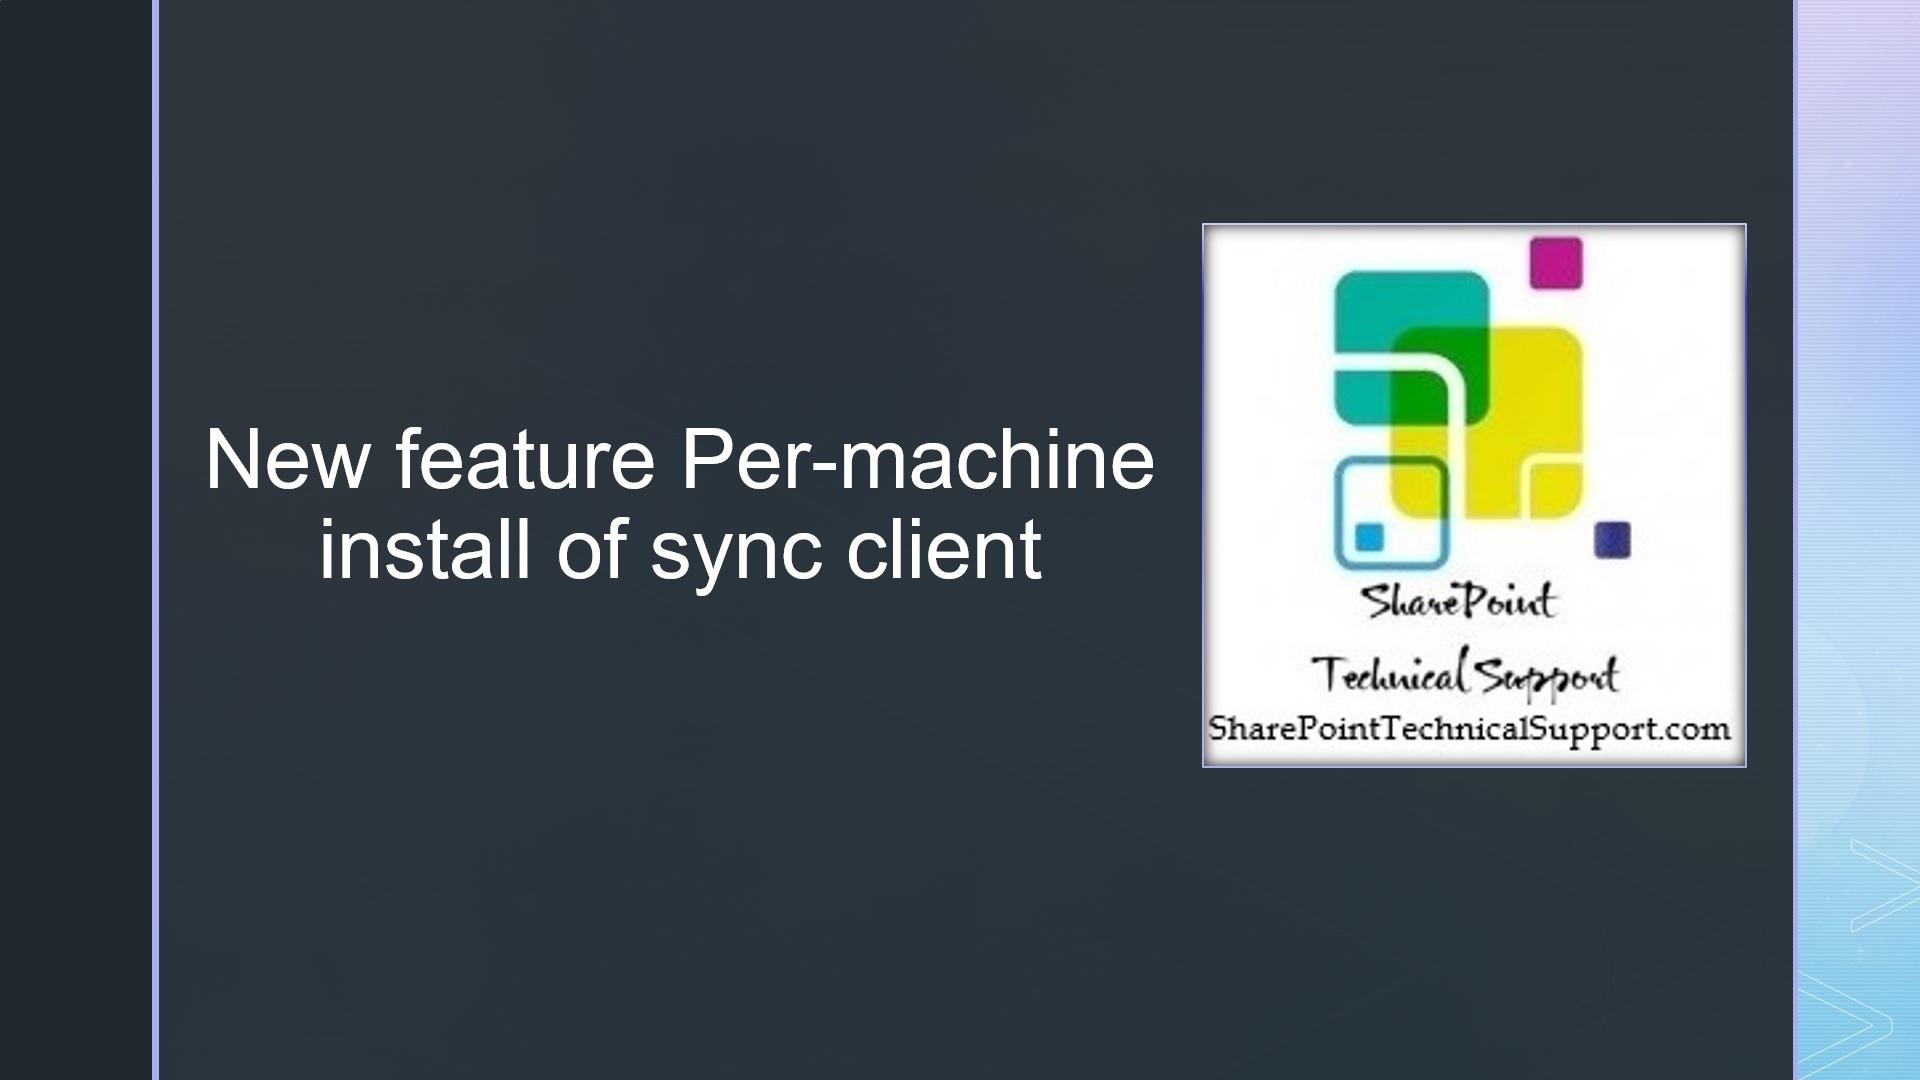 Site | SharePointTechnicalSupport